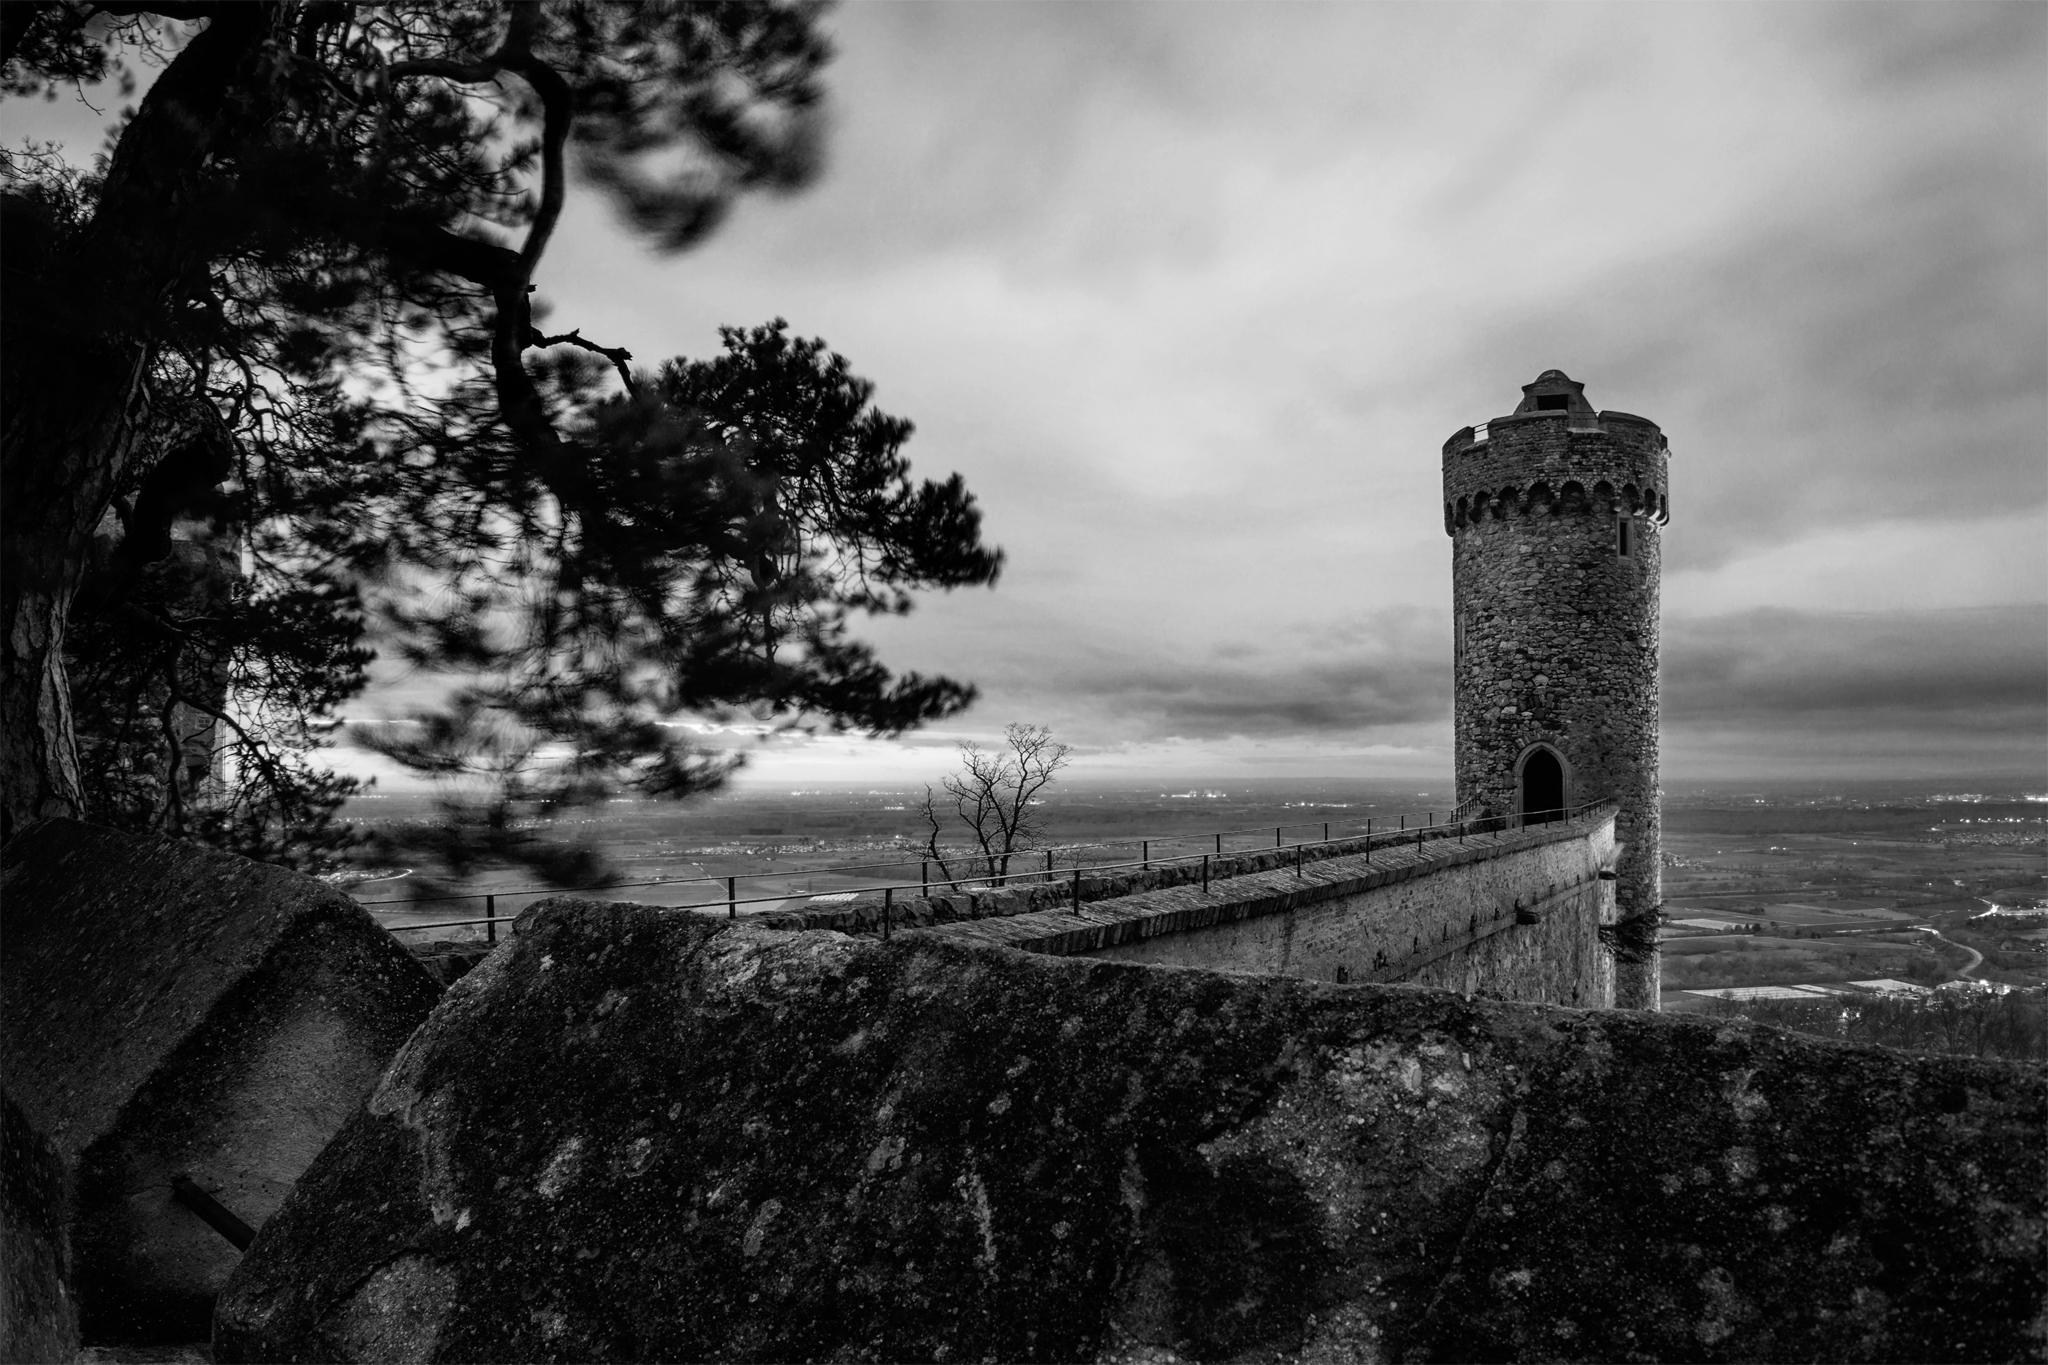 Auerbach Castle, Germany